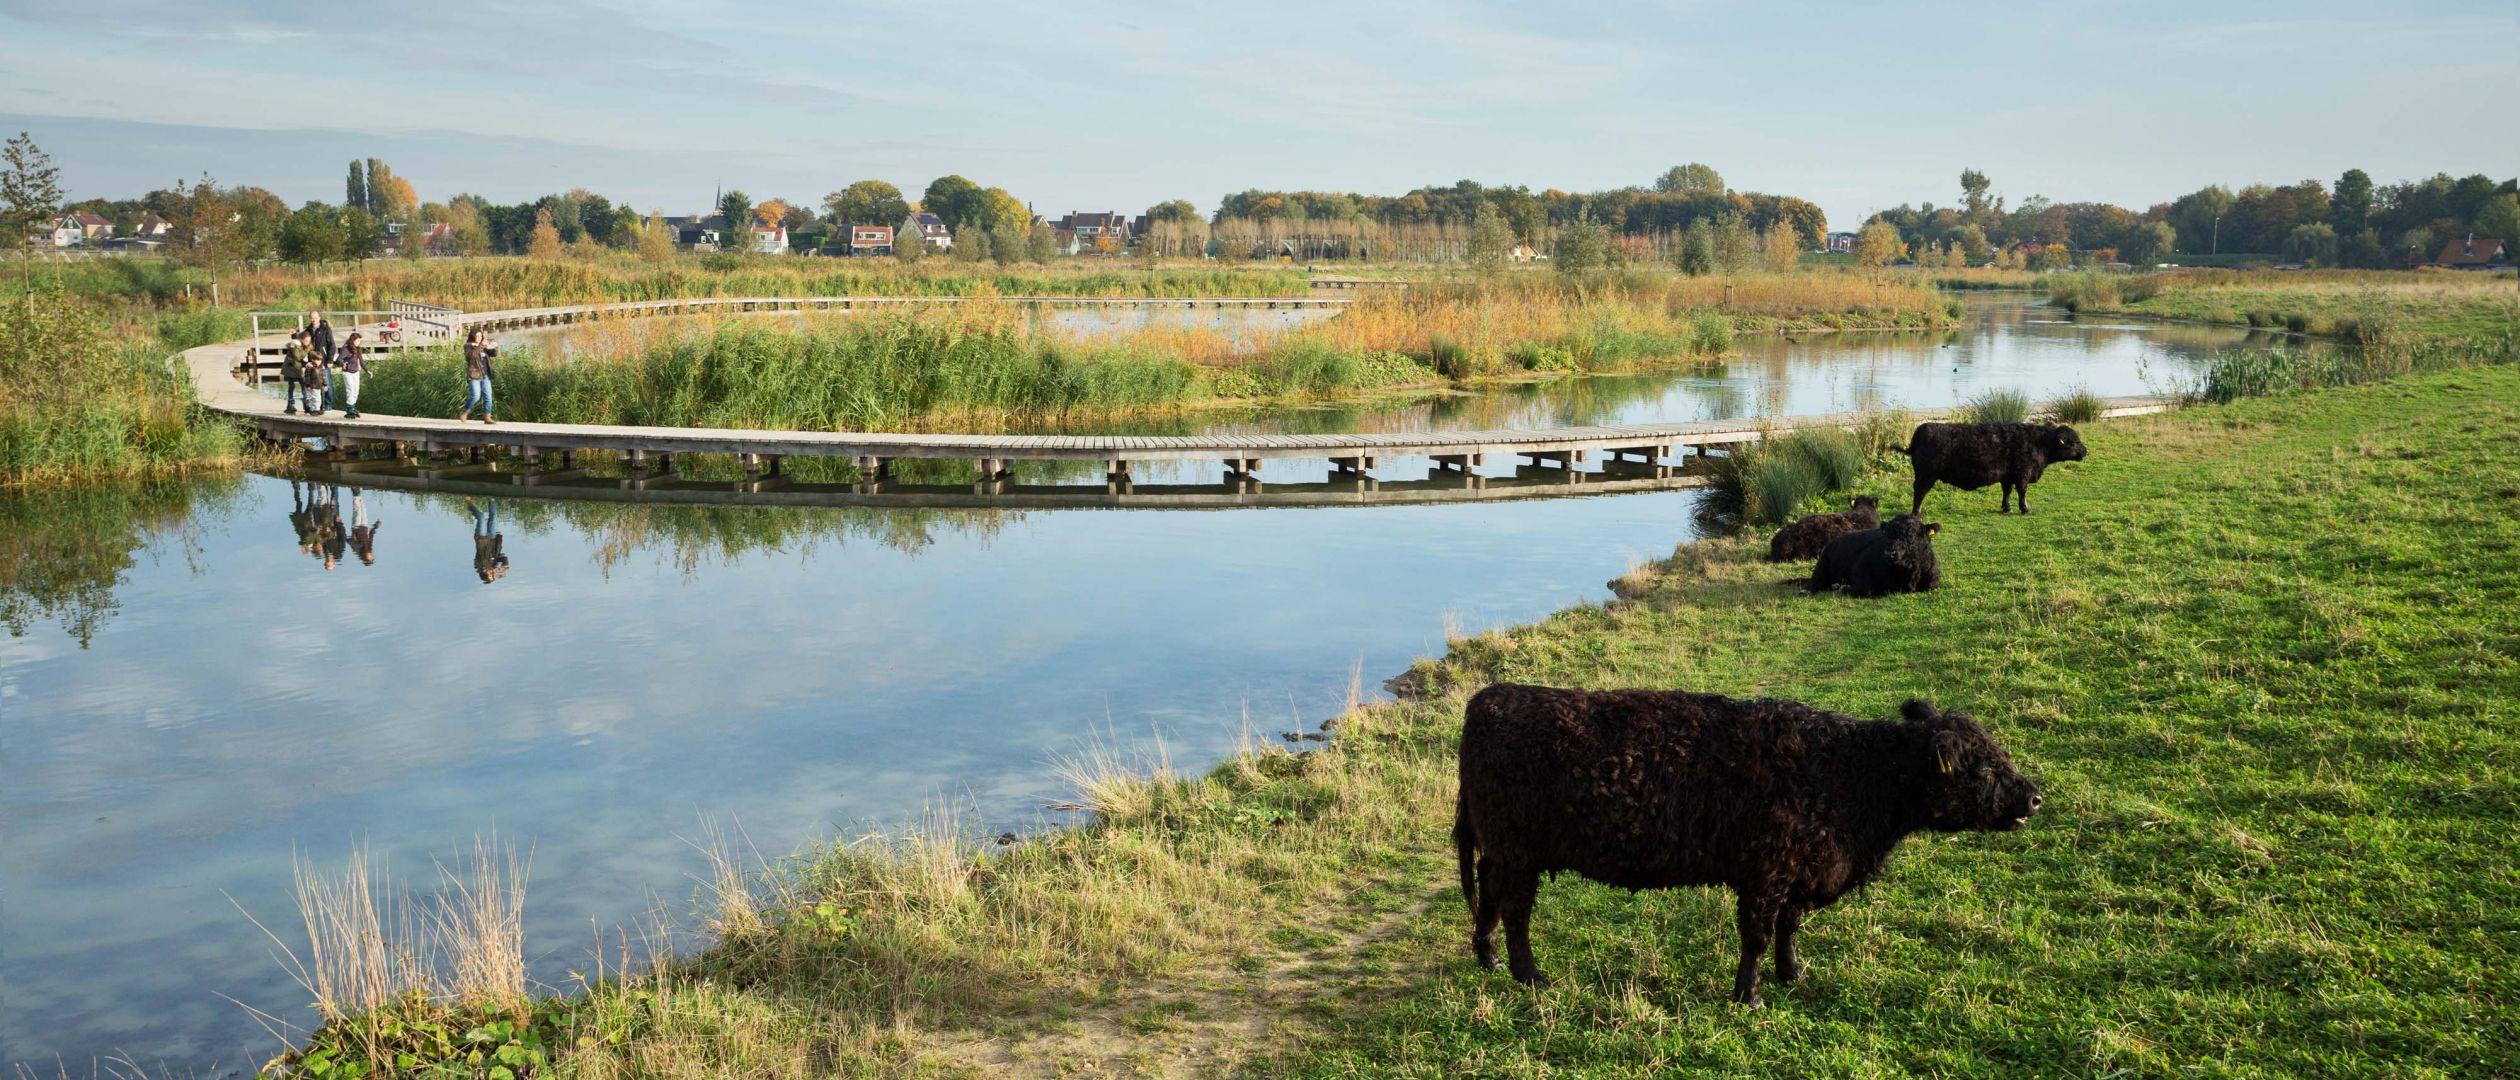 Landschapspark Zuidpolder, Rotterdam Regio, Barendrecht